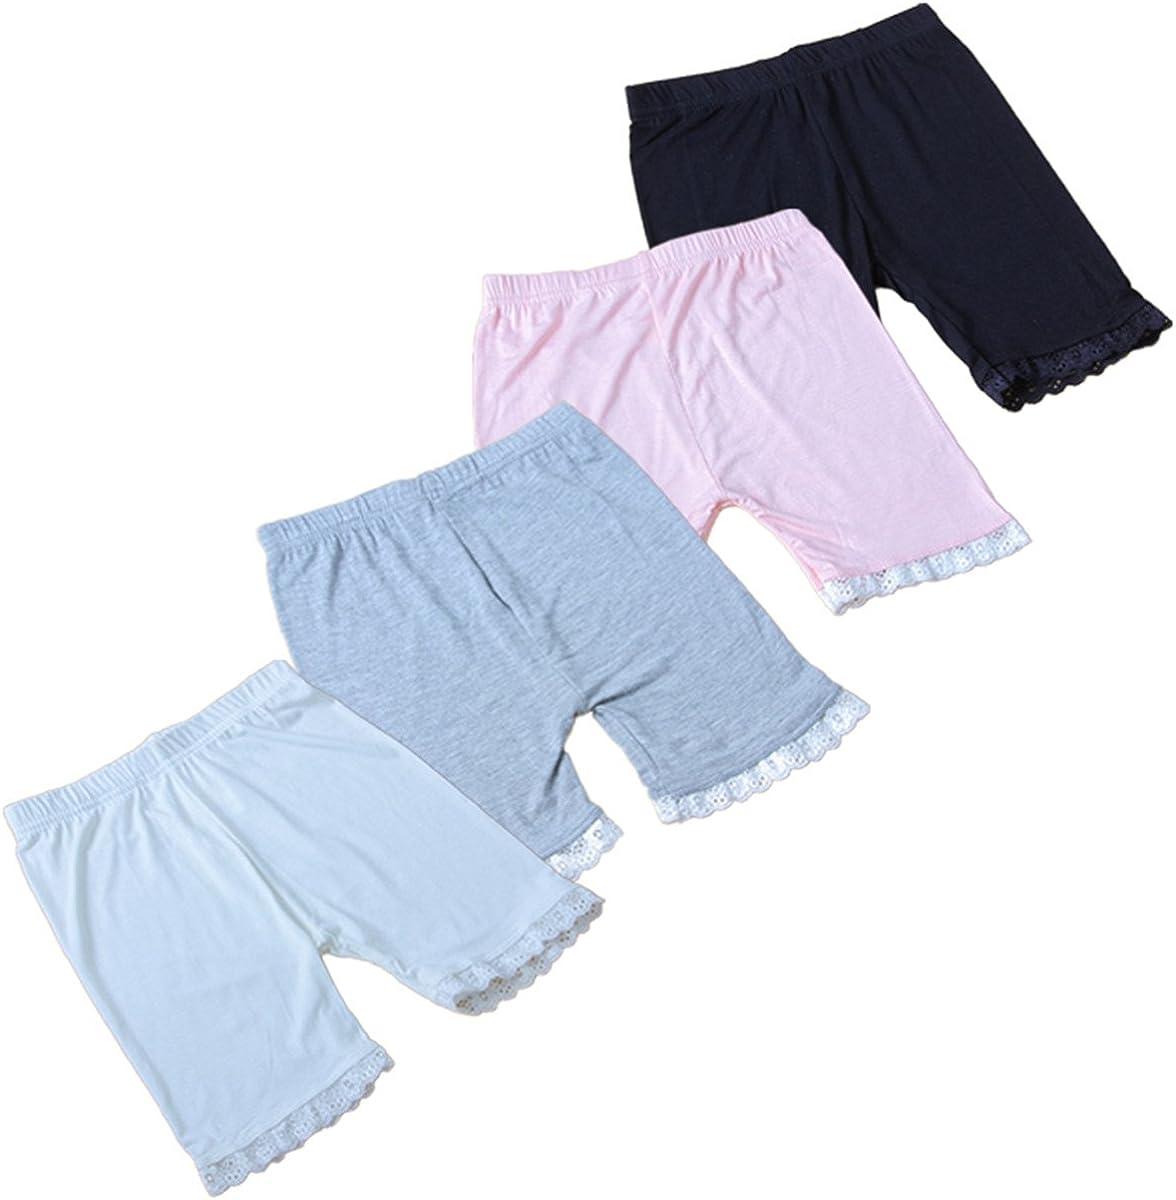 JELEUON 4Pcs Little Girls Kids Slim Elastic Lace Underwear Safety Short Panties Dancewear